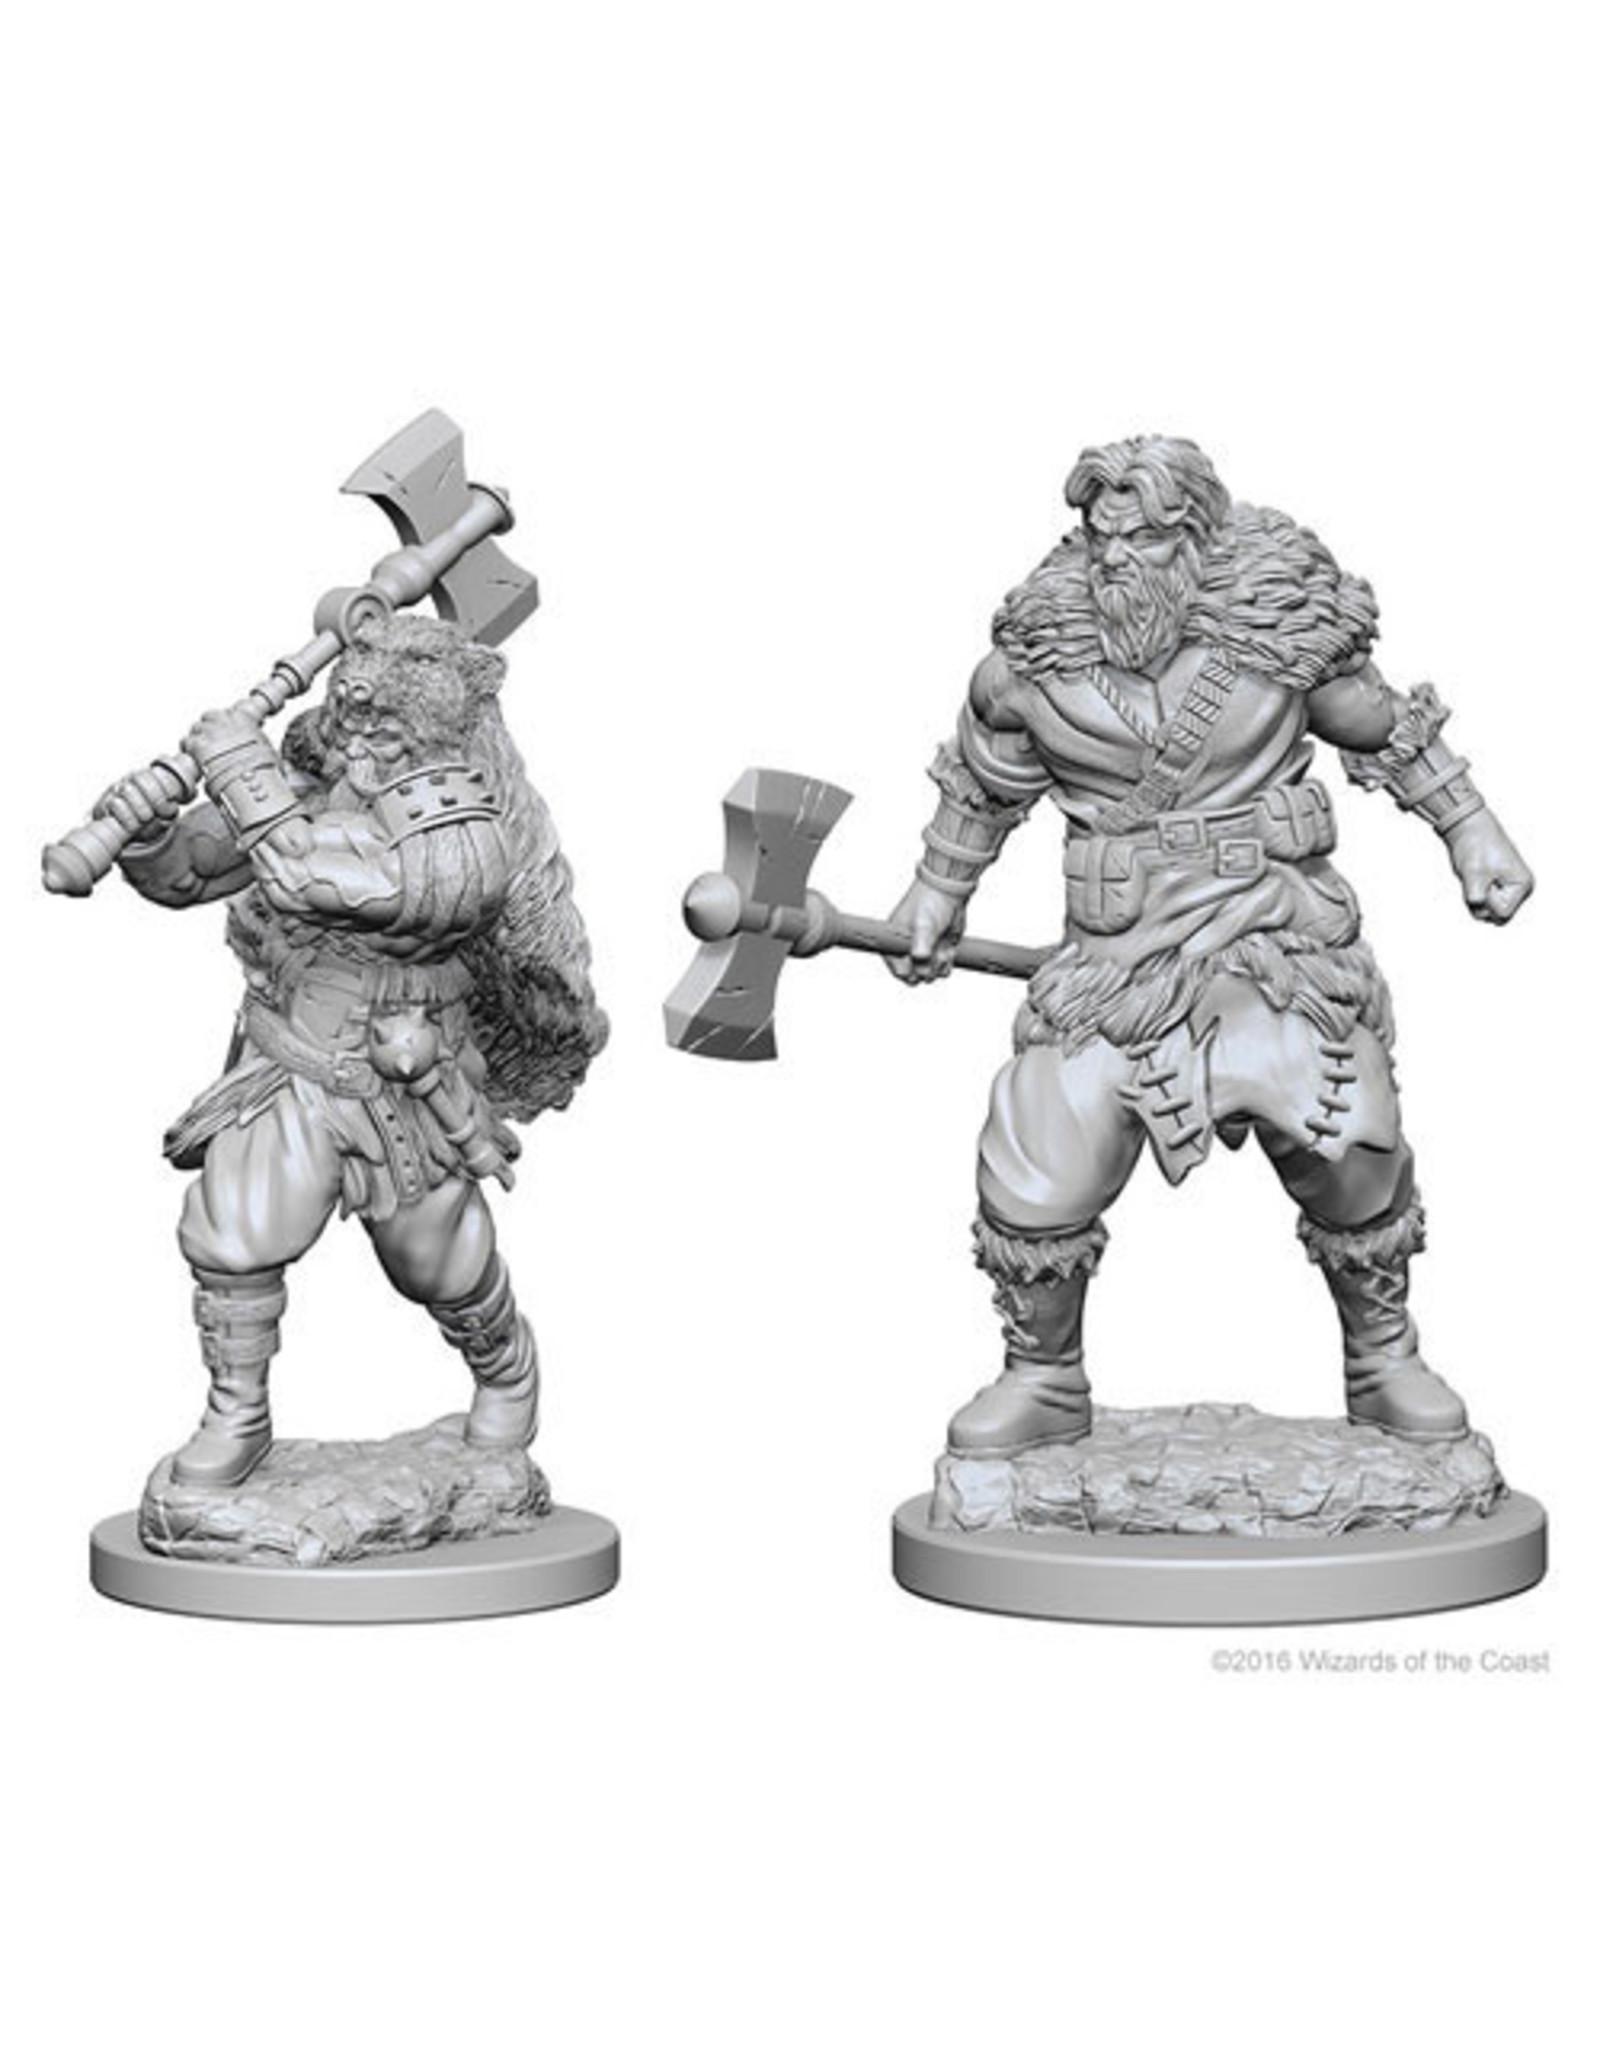 Dungeons & Dragons D&D NMU Human Male Barbarian